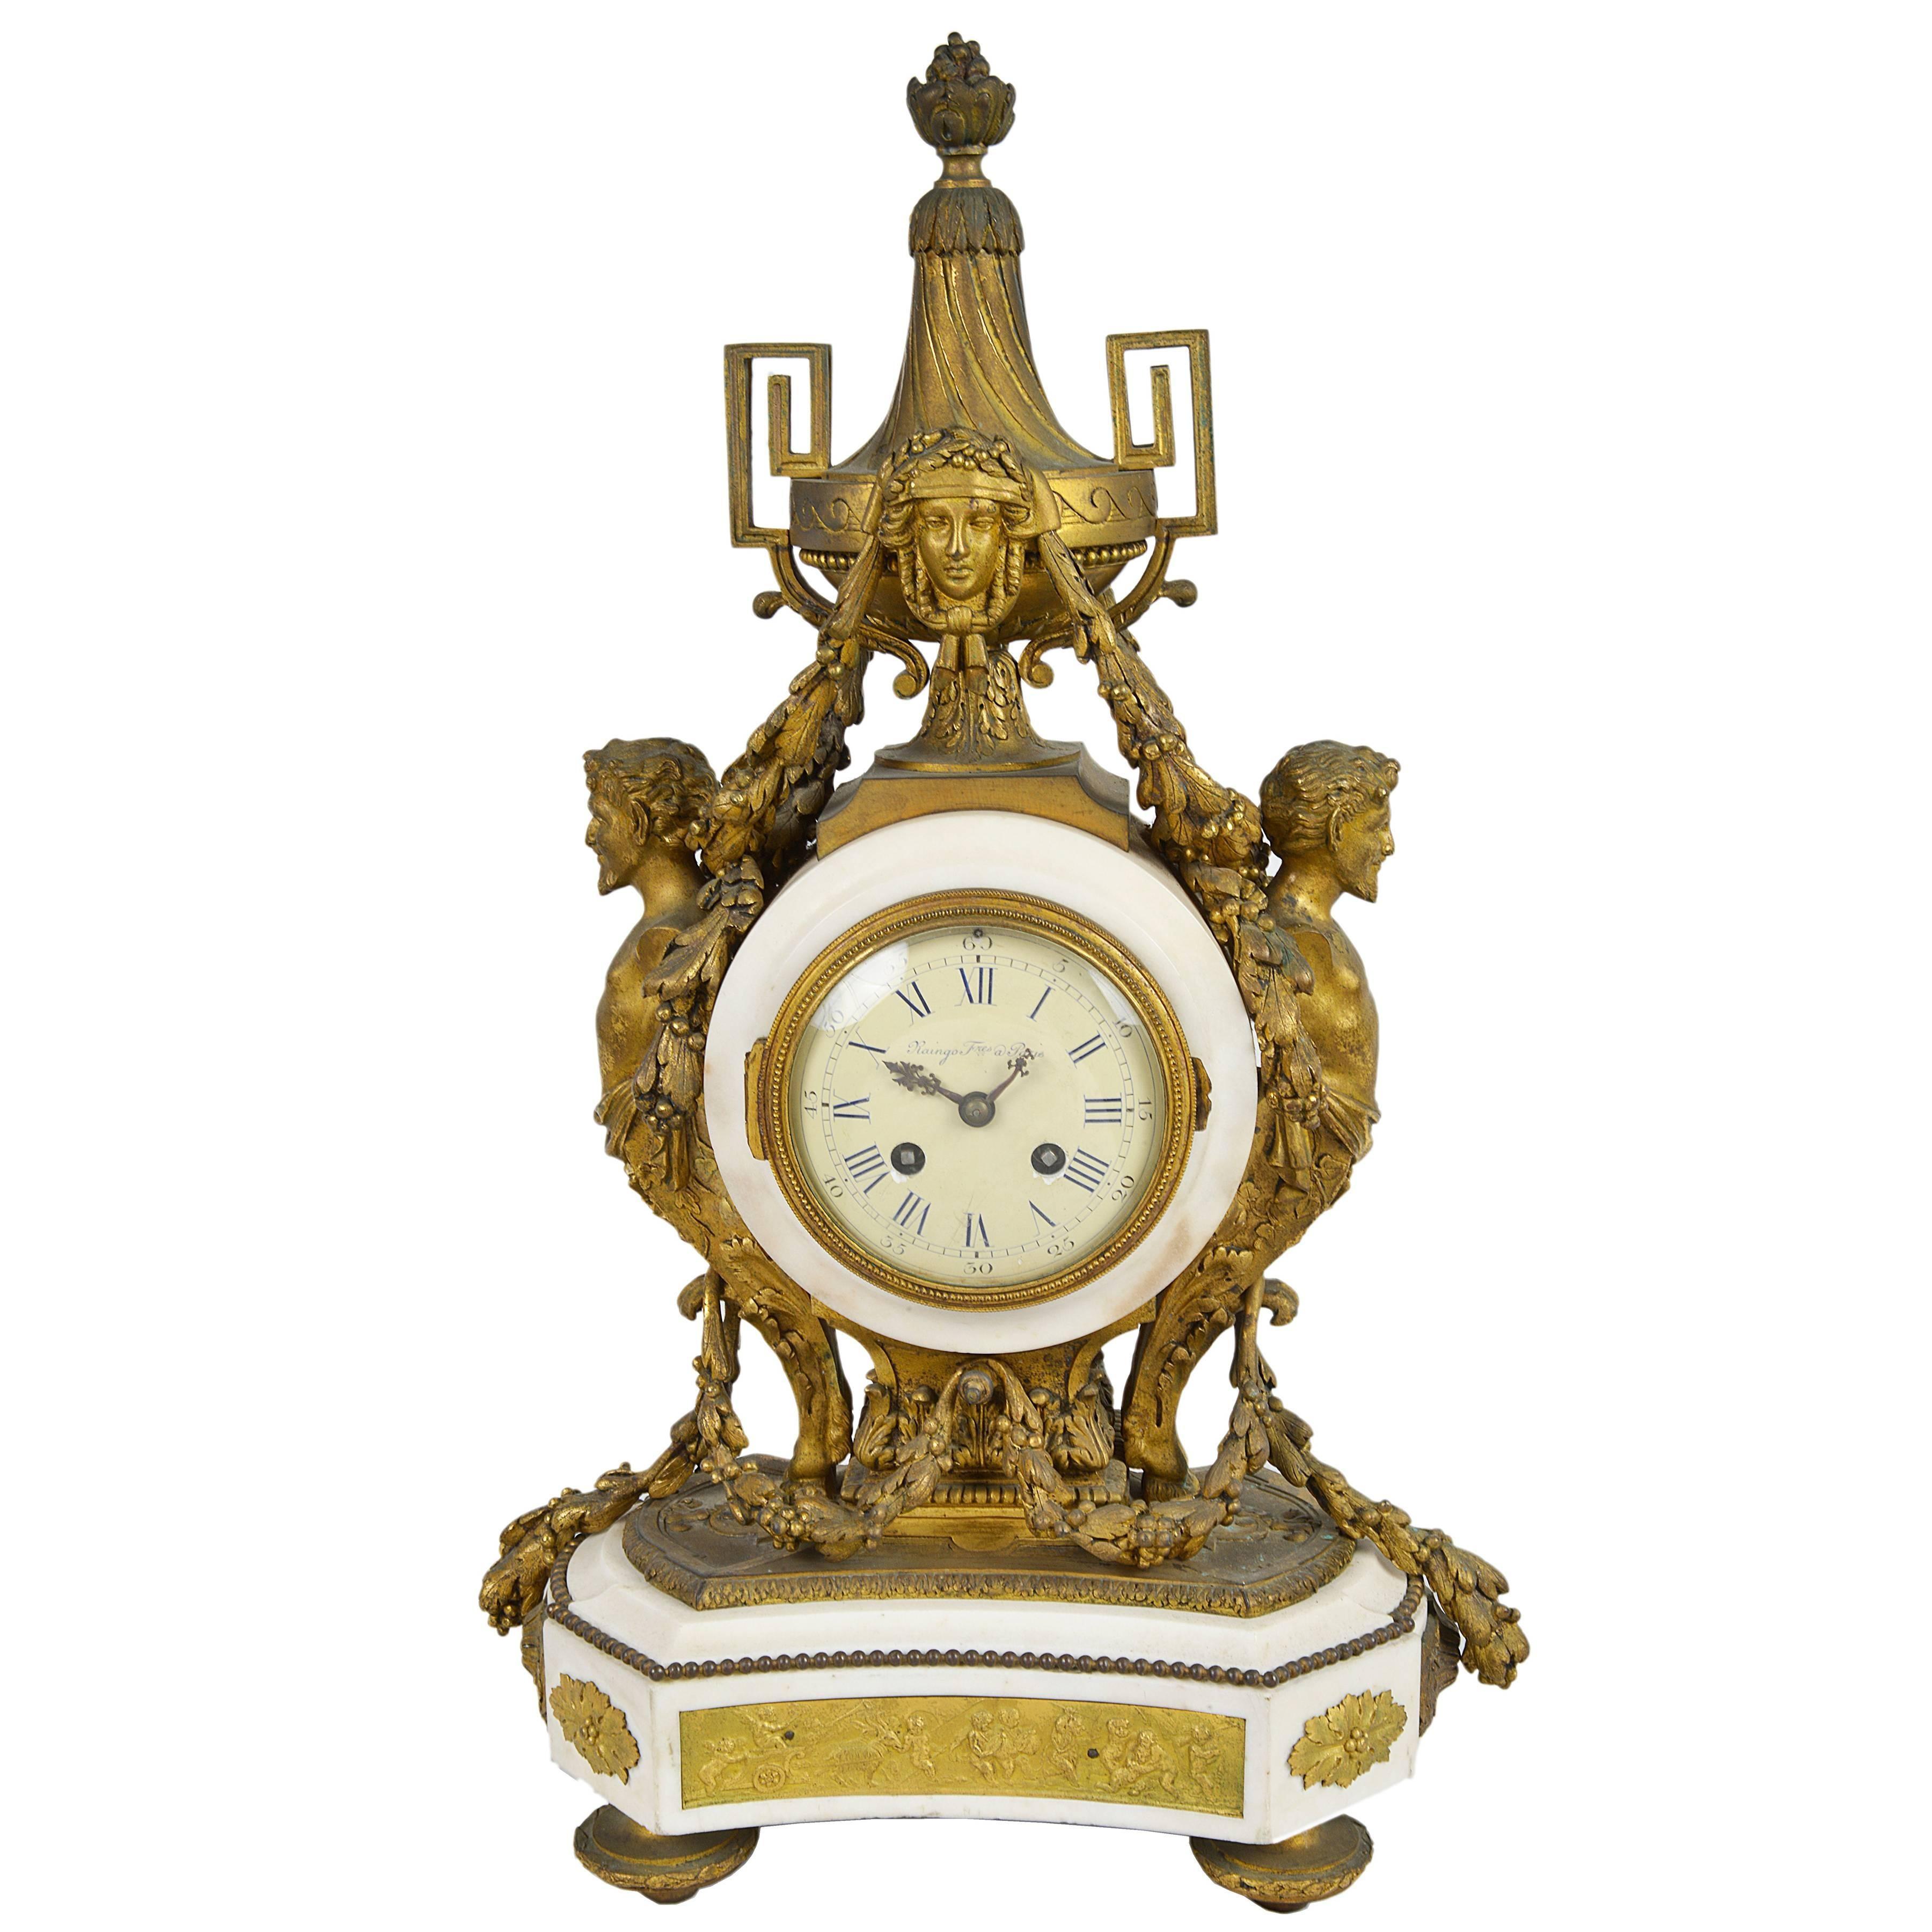 Raingo Fres, Paris. Louis XVI Style Mantel Clock